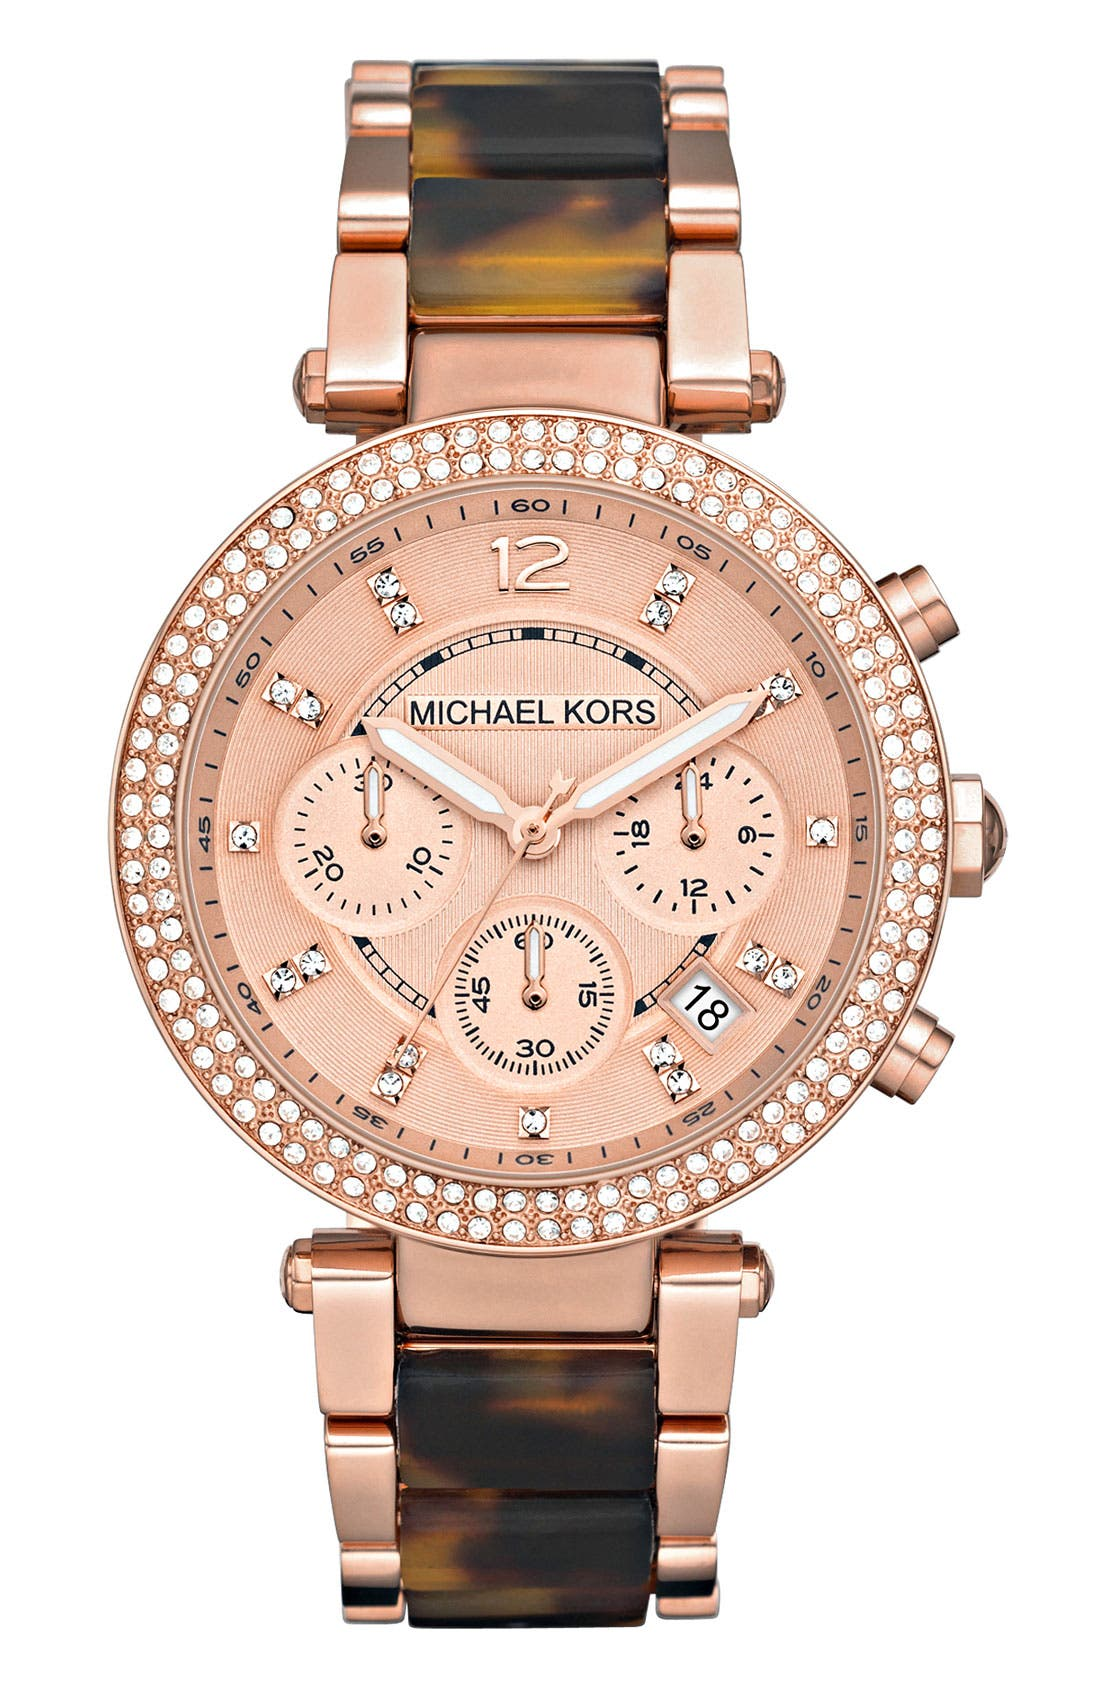 Main Image - Michael Kors 'Parker' Blush Acetate Link Chronograph Watch, 39mm